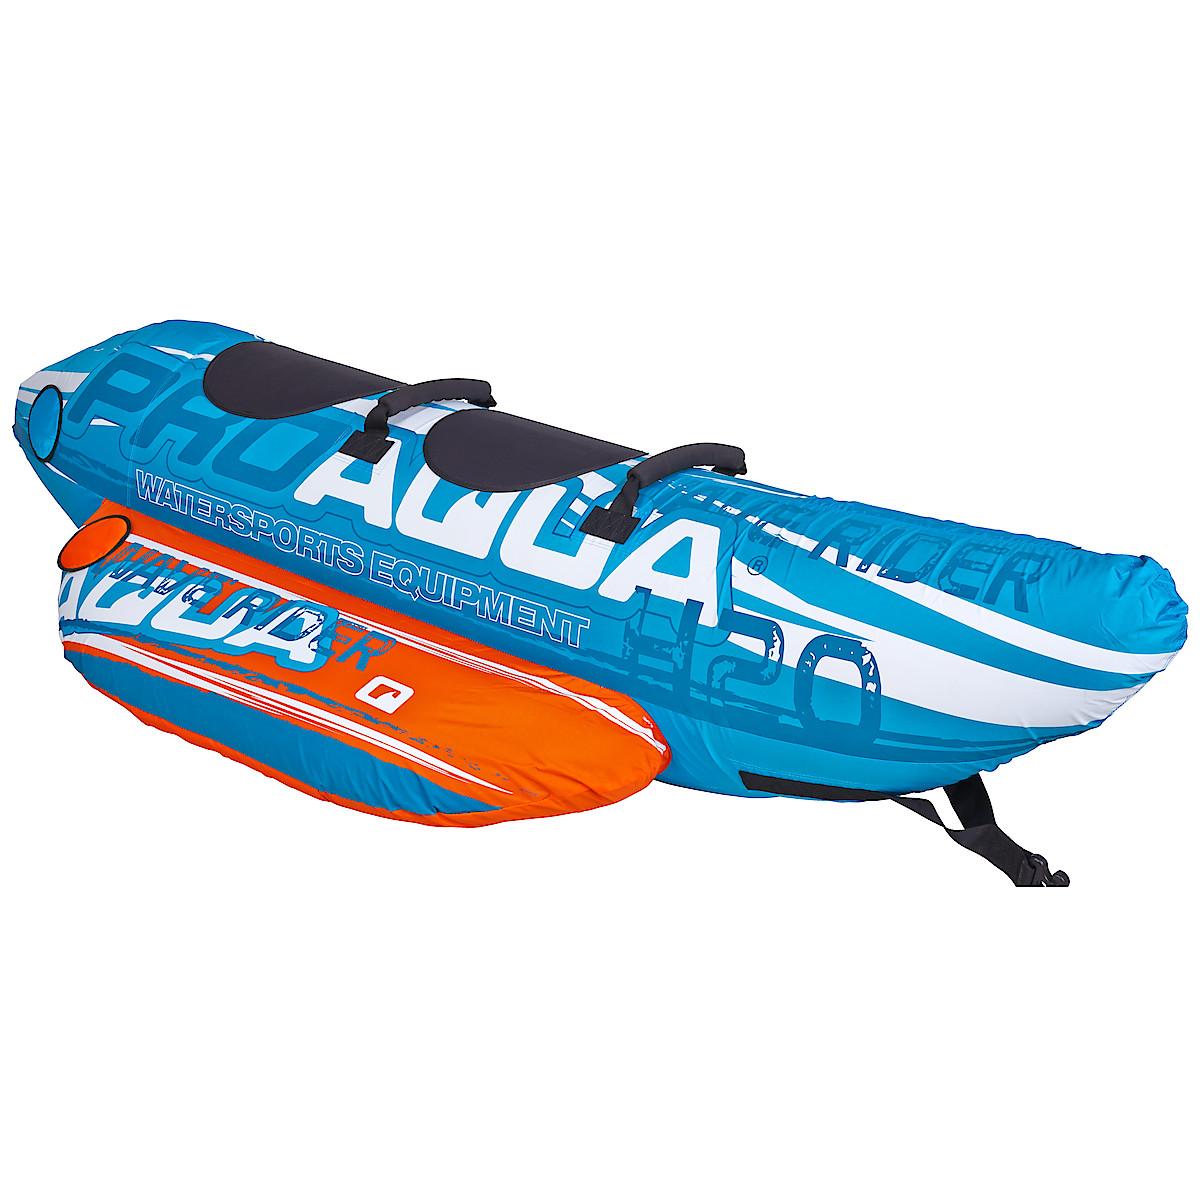 Water tube Proaqua Wave Rider